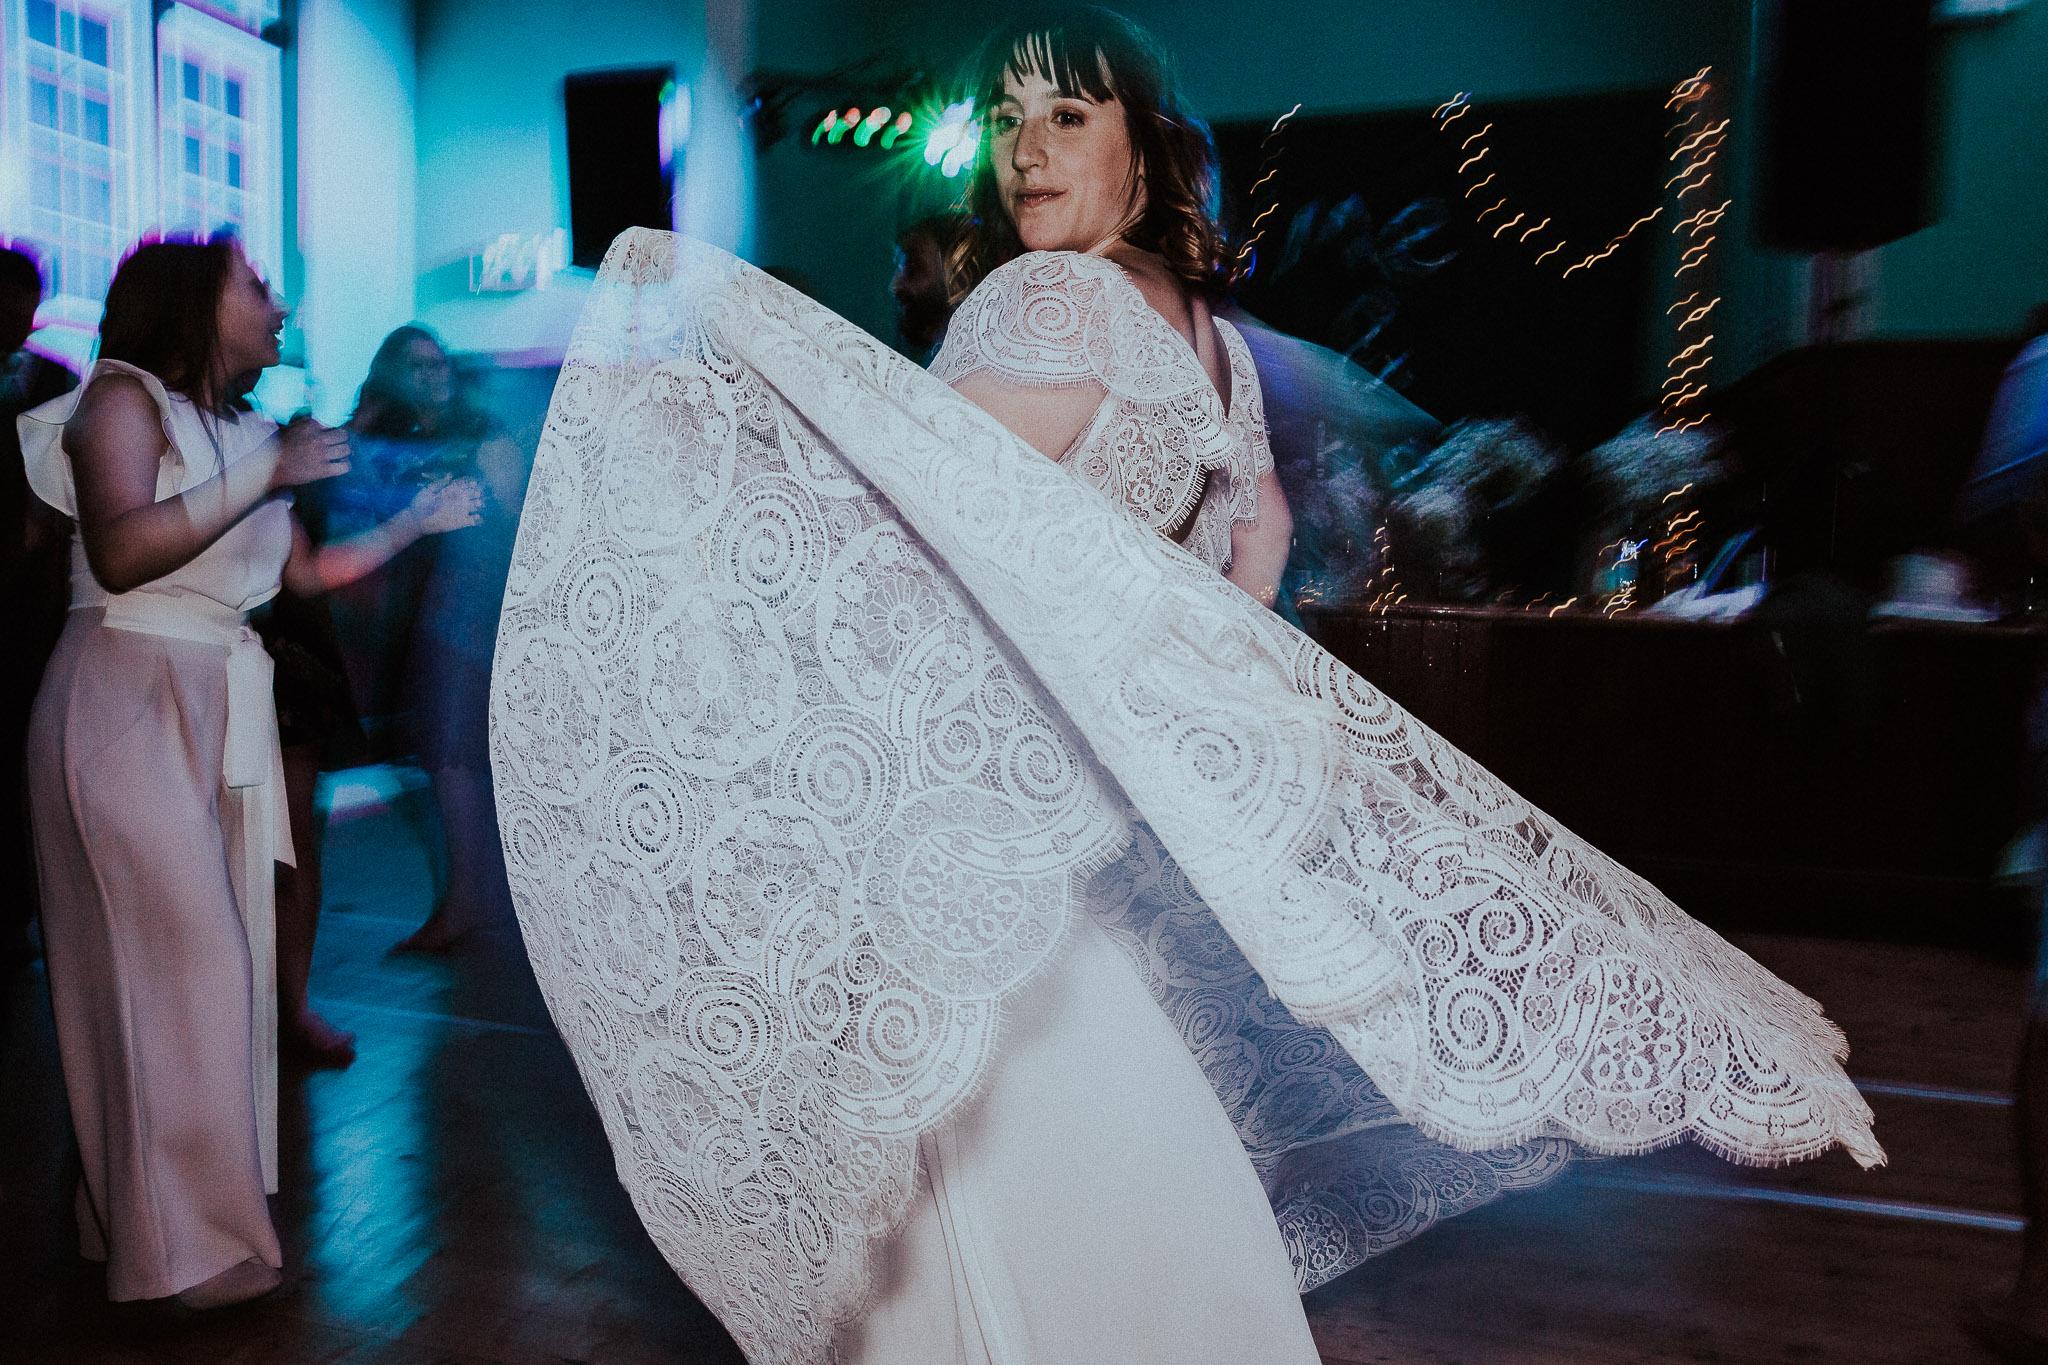 Manchester_Alternative_Wedding_Photographer-104.jpg